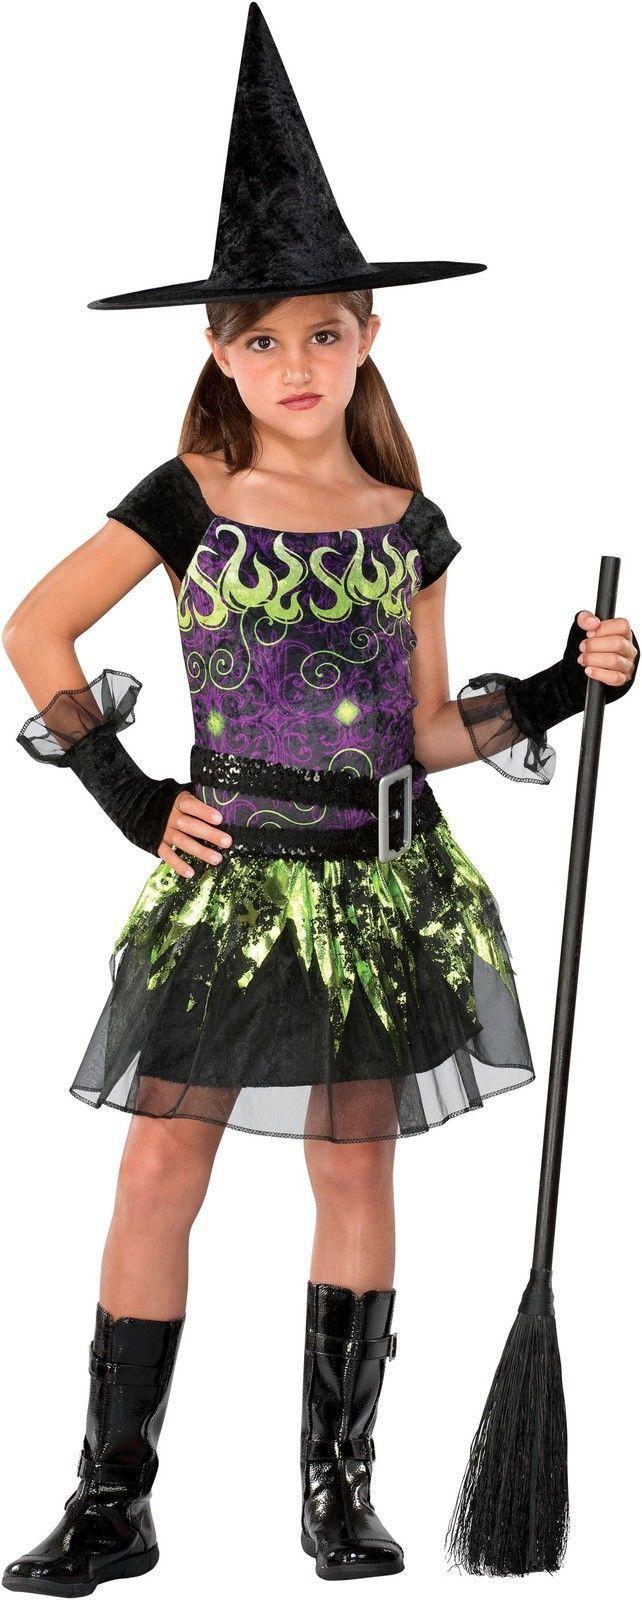 Spellcaster Witch Child Costume | eBay  sc 1 st  Pinterest & Spellcaster Witch Child Costume | eBay | Halloween | Pinterest ...